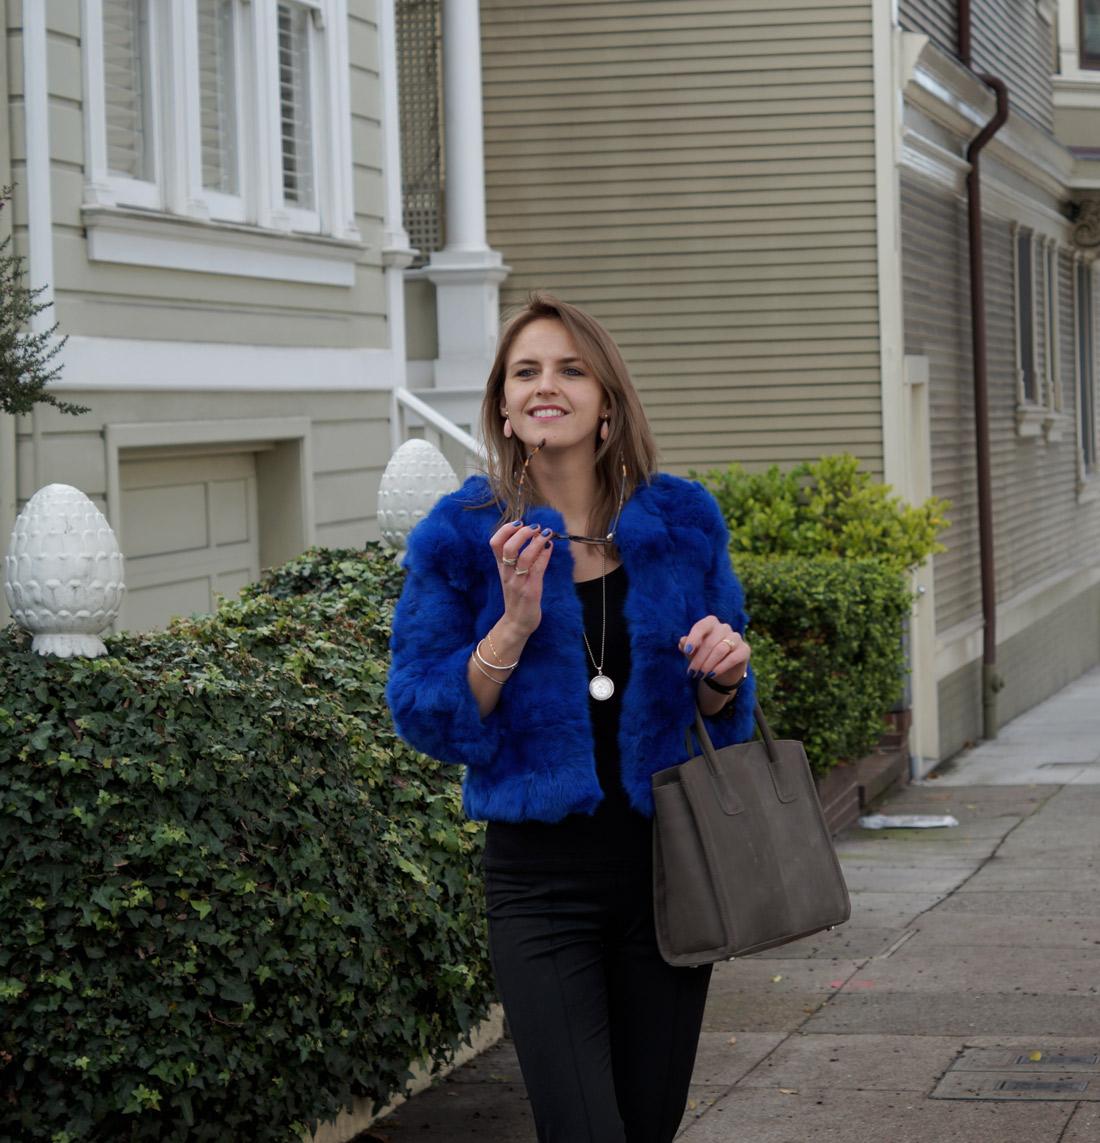 bag-at-you-fashion-blog-dezzal-blue-fur-coat